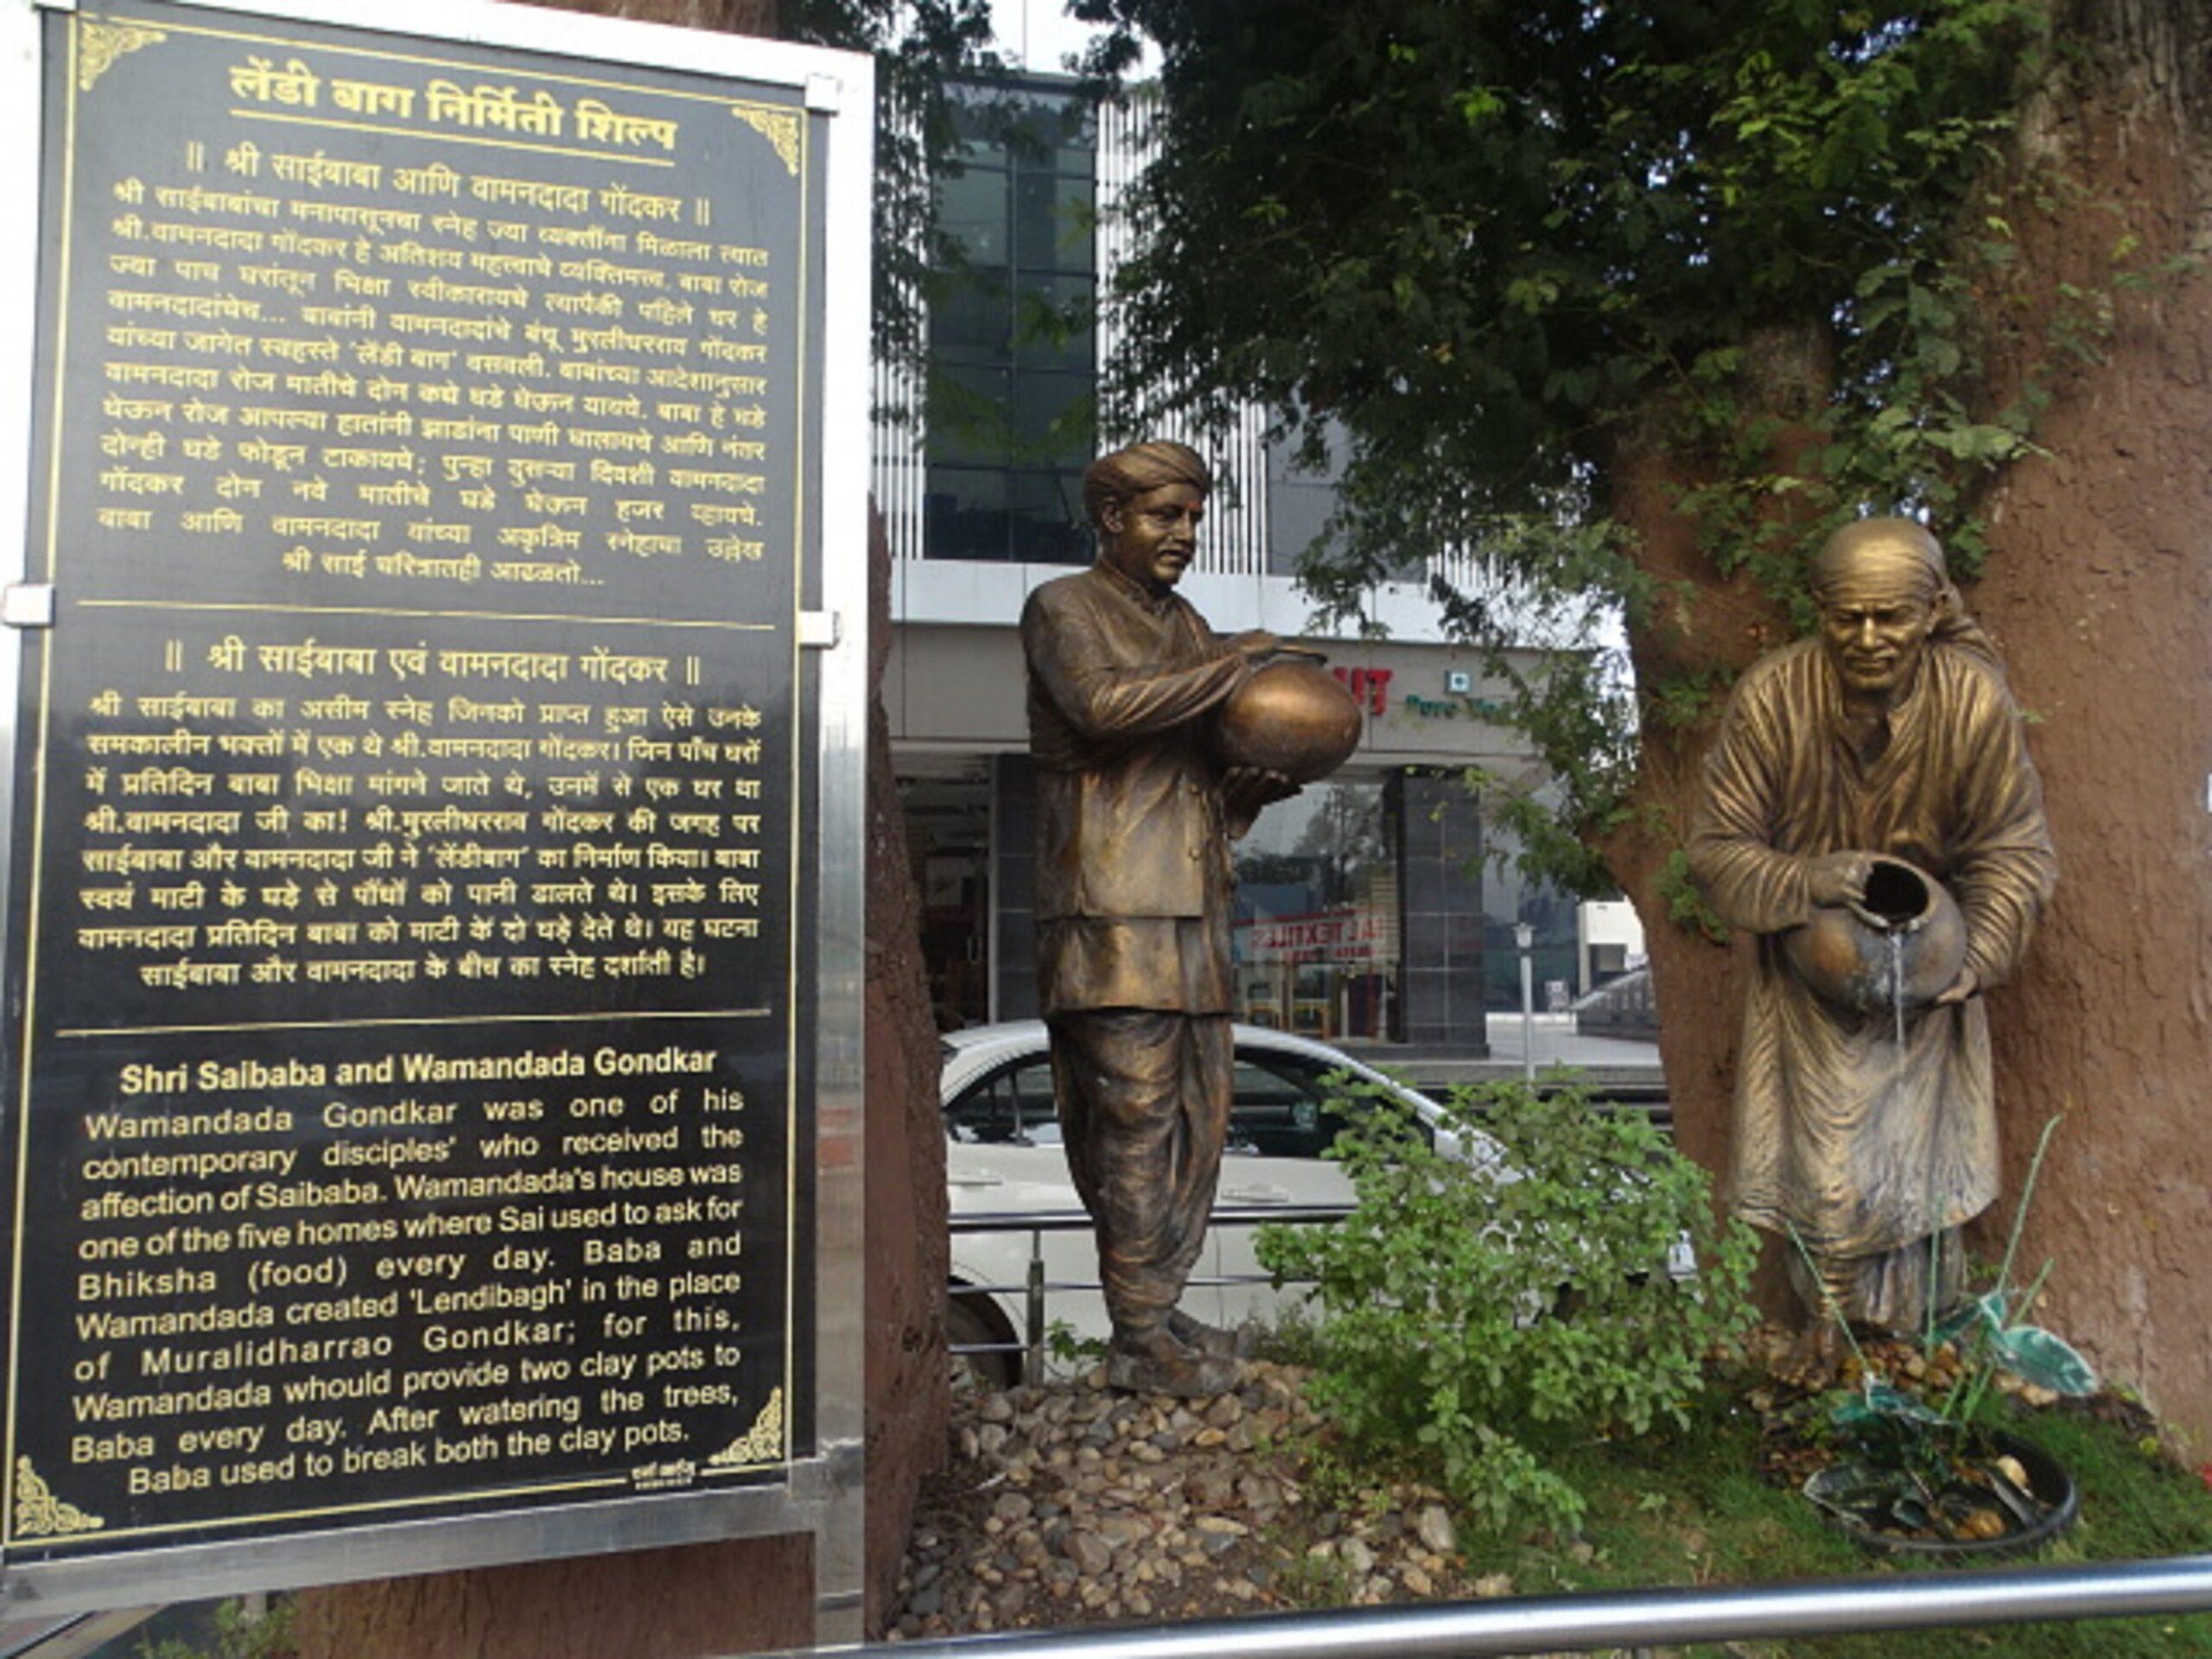 About: Shri Saibaba and Wamandada Gondkar (Shirdi, Maharashtra)